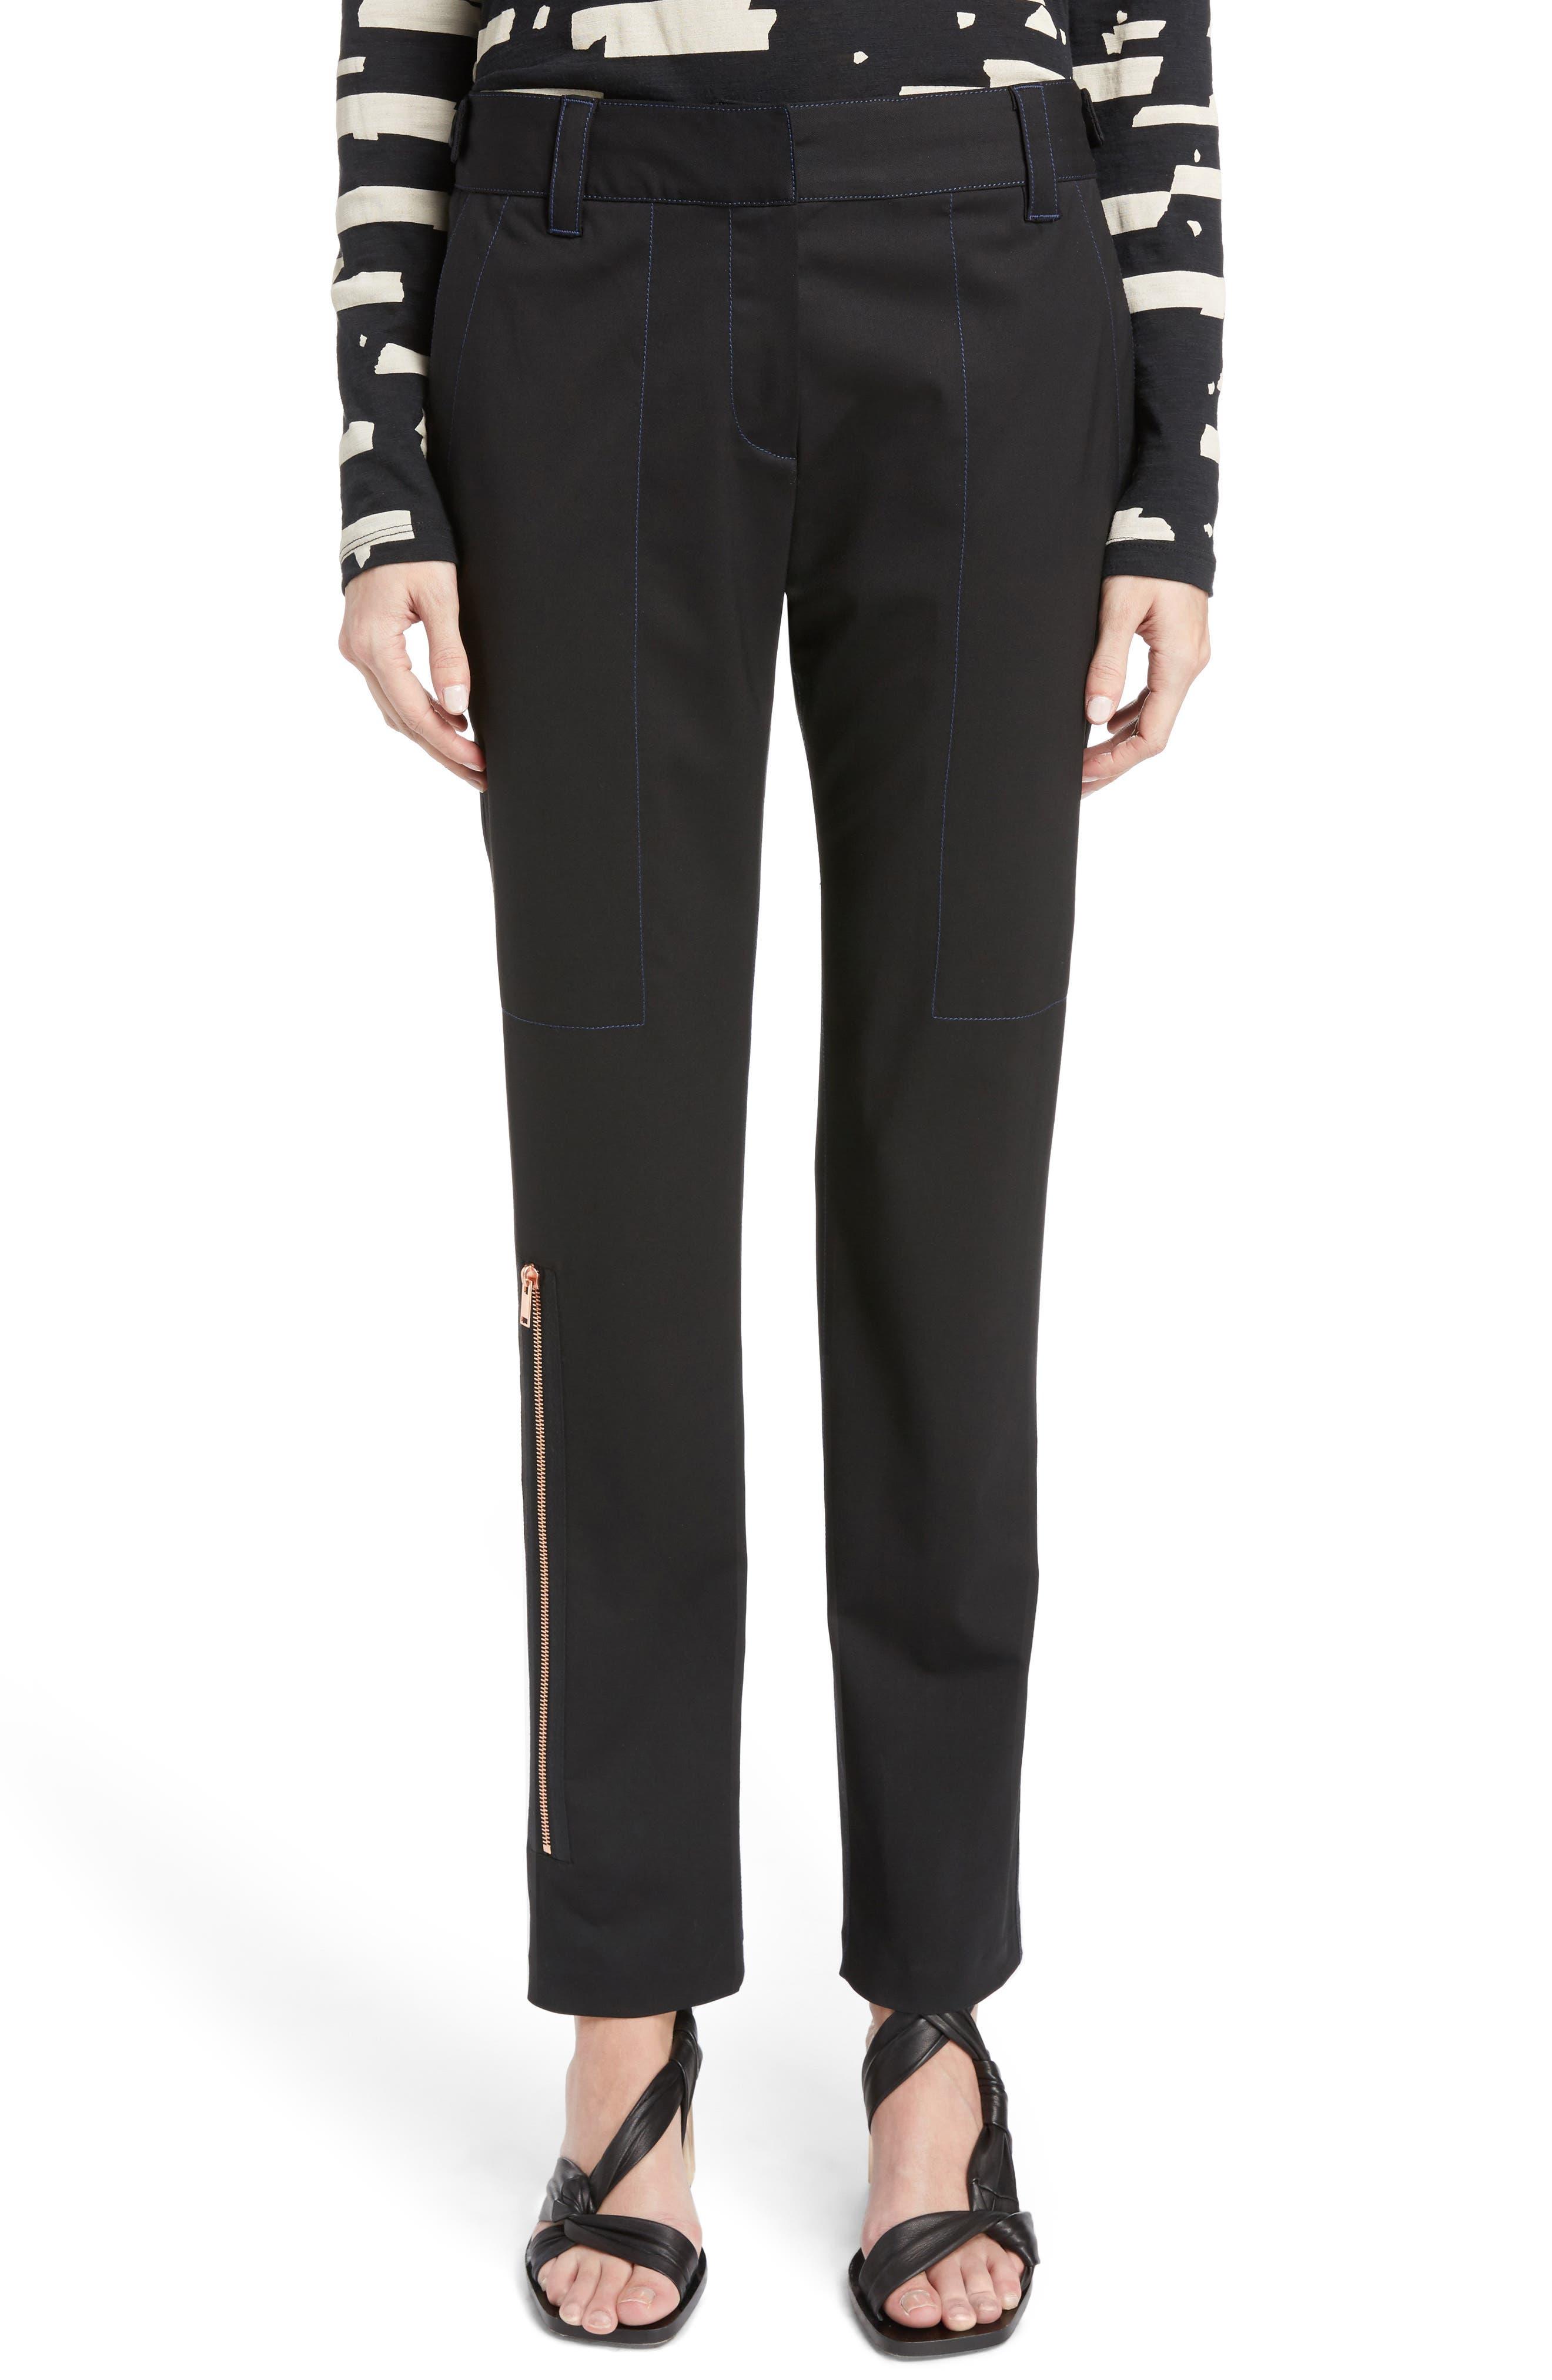 Proenza Schouler Stretch Wool Straight Leg Pants